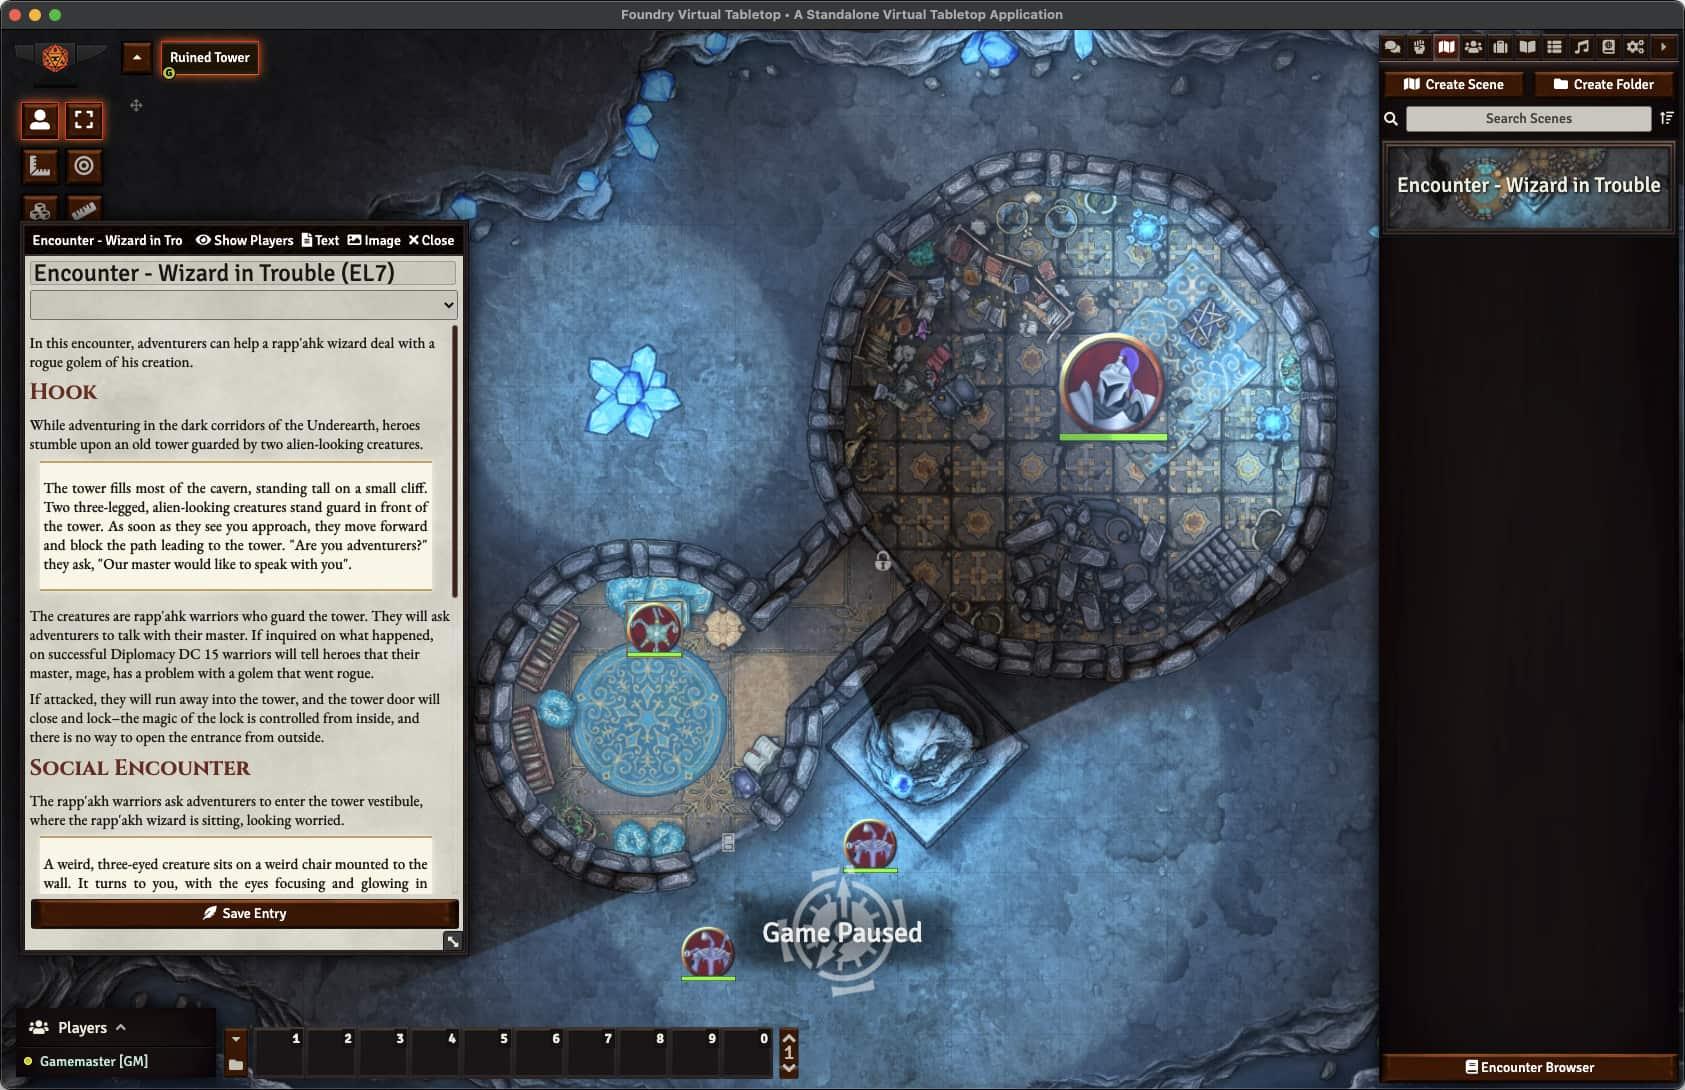 A screenshot depicting a cavern scene with an open NPC Character sheet